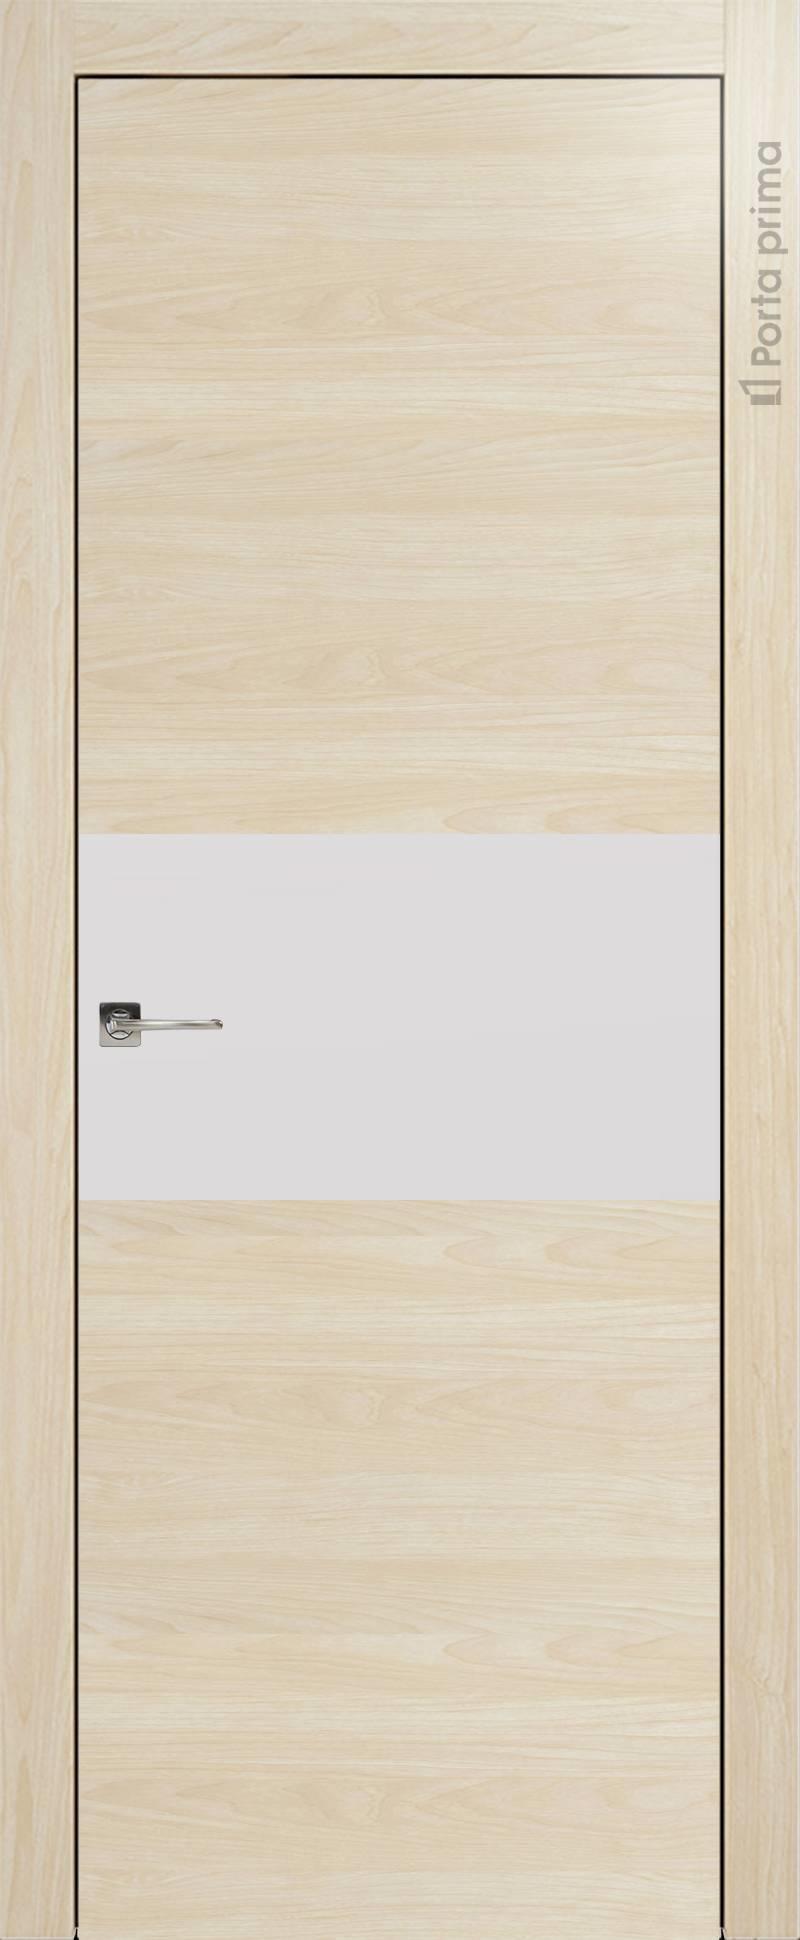 Tivoli Е-4 цвет - Клен Без стекла (ДГ)